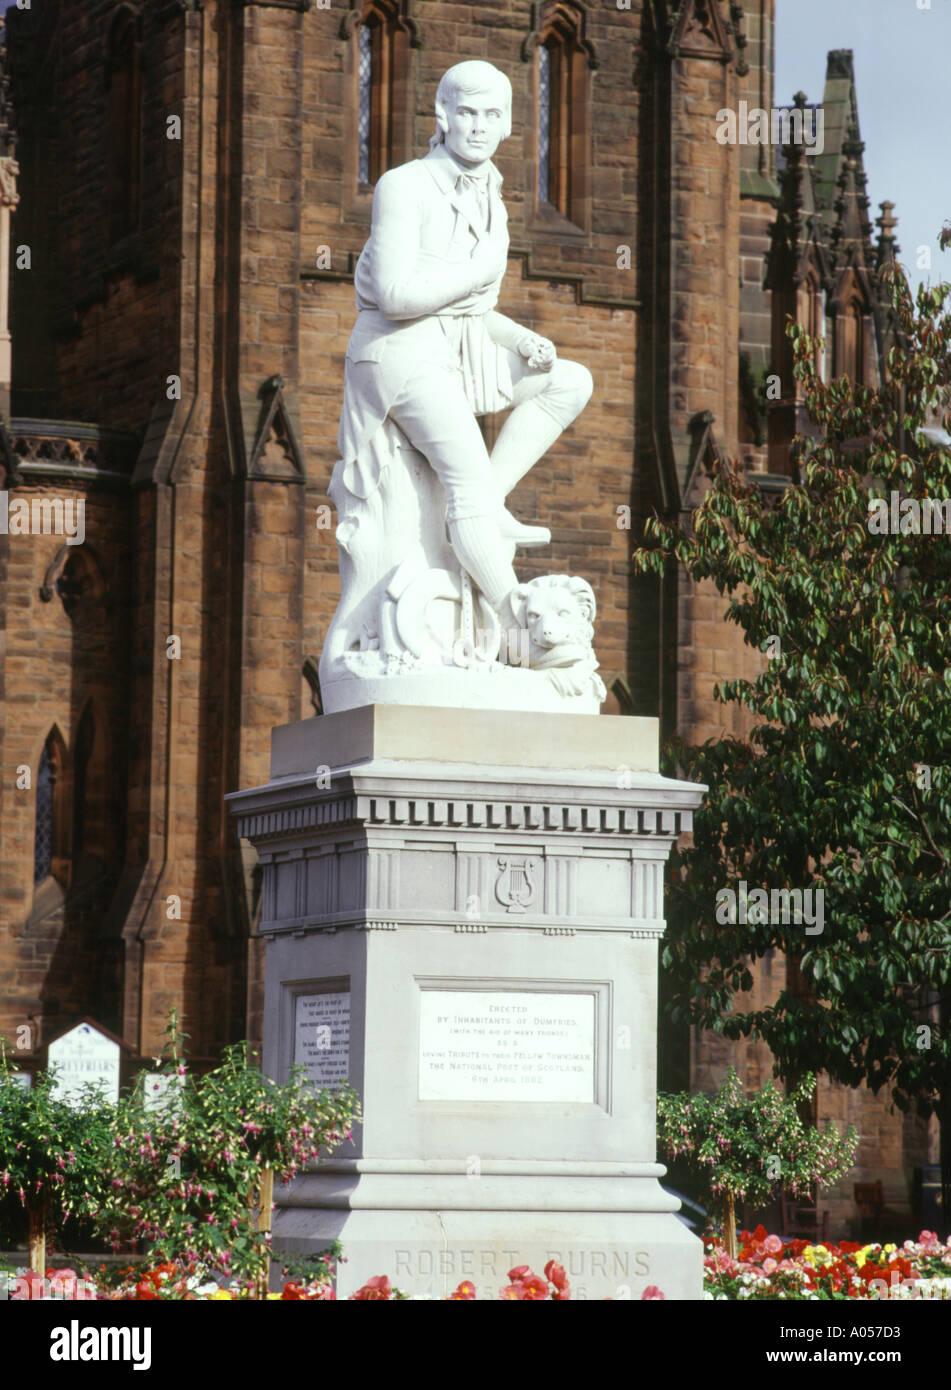 dh Robert Burns DUMFRIES GALLOWAY Estatua de Robbie Poeta bard figuras escocesas históricas monumentos de escocia Foto de stock